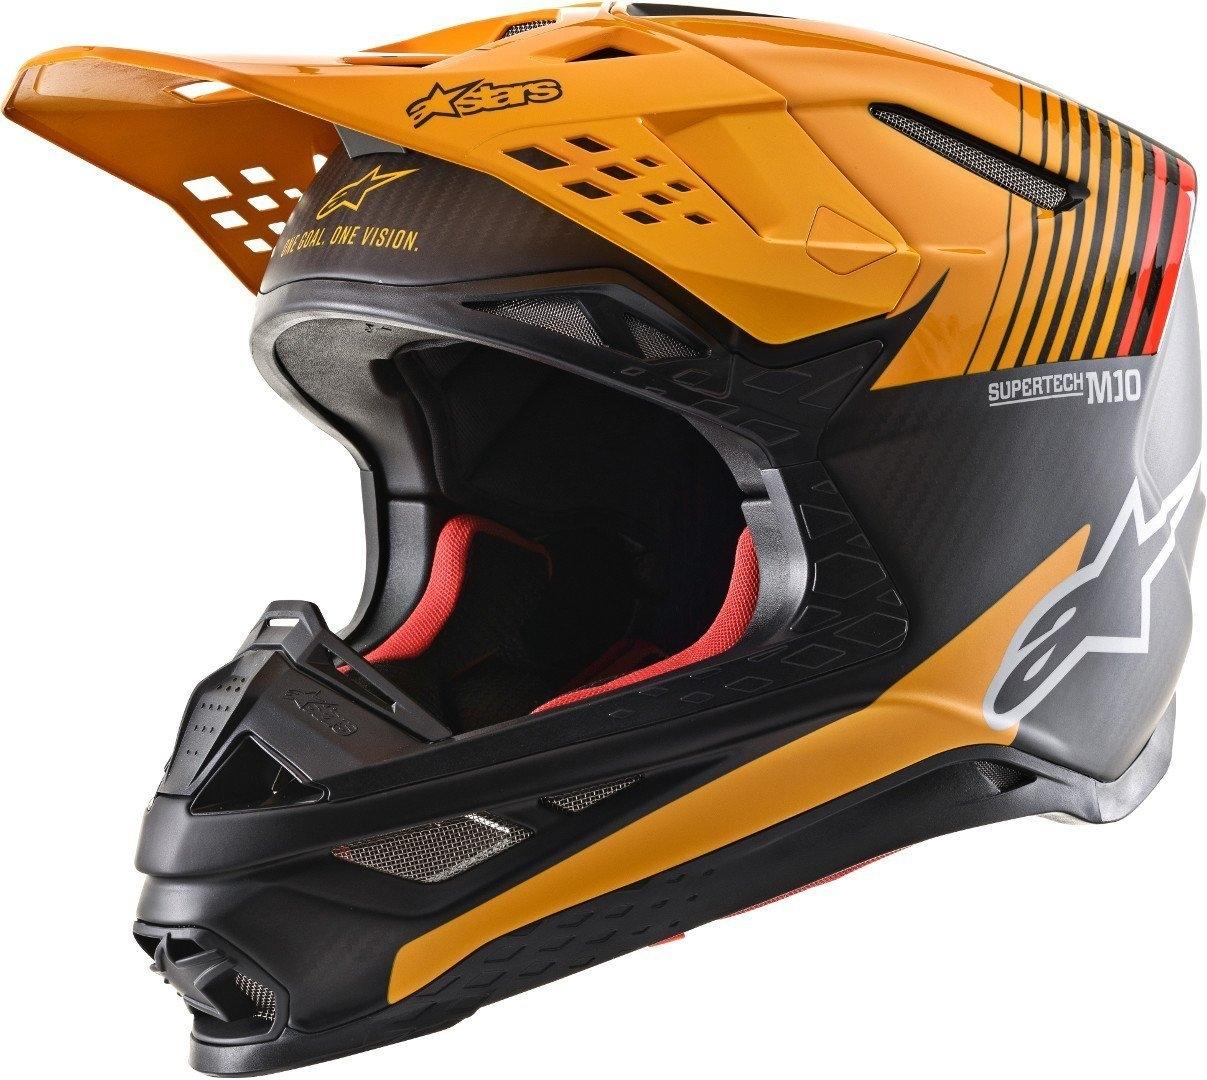 Casco cross alpinestars SUPERTECH S-M10 DYNO Black Carbon Orange M&G 1